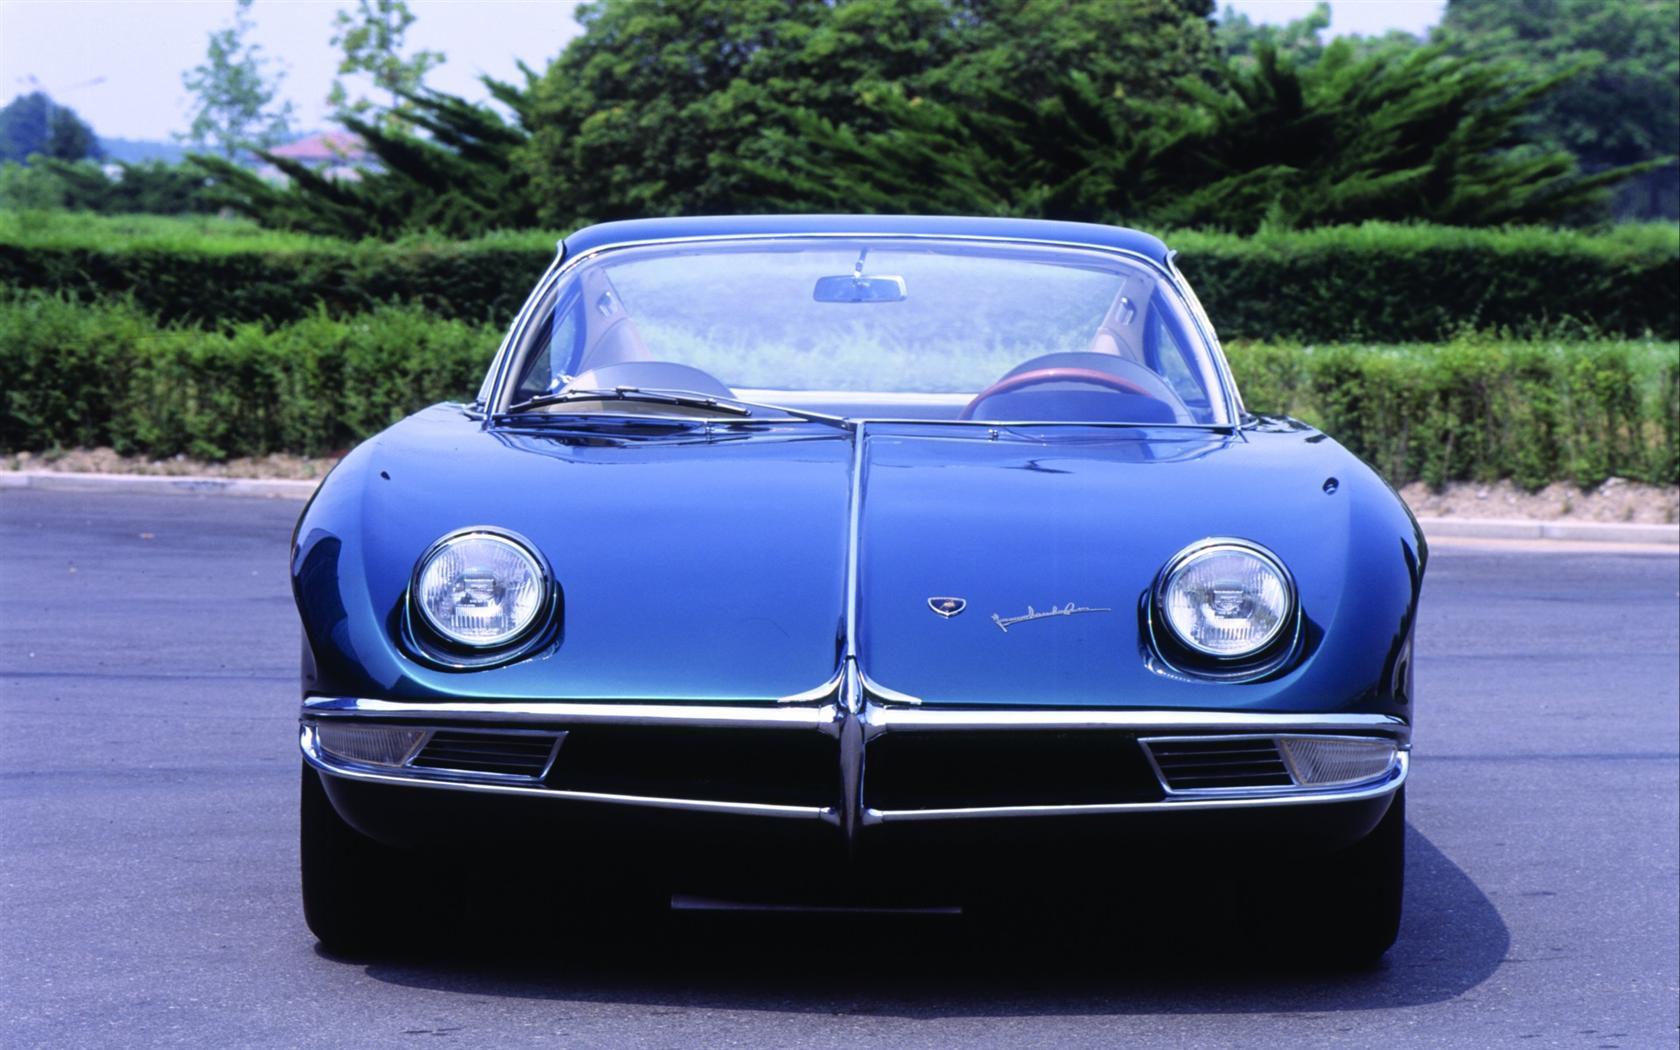 1963 Lamborghini 350 Gtv Image